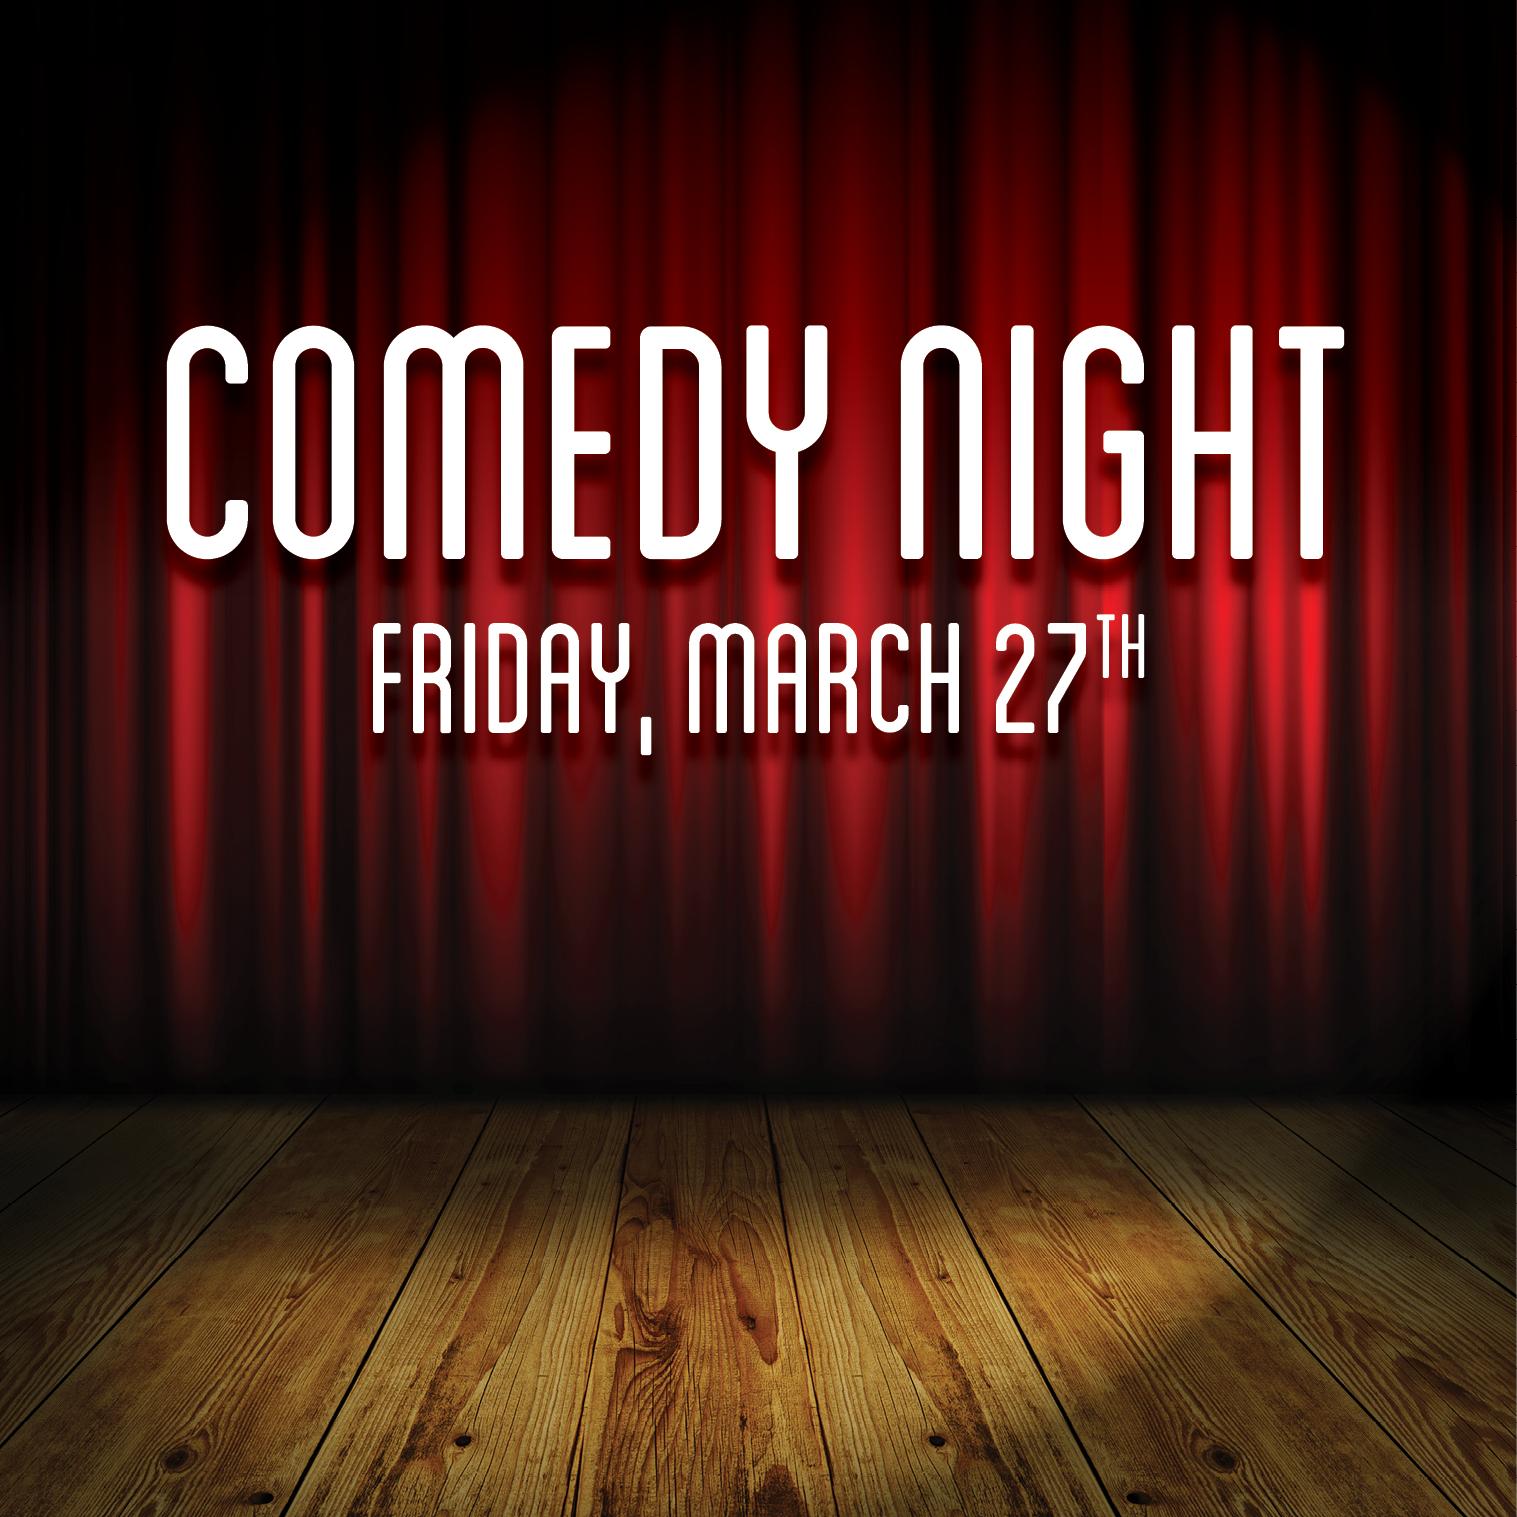 Comedy Night at Hiddenbrooke